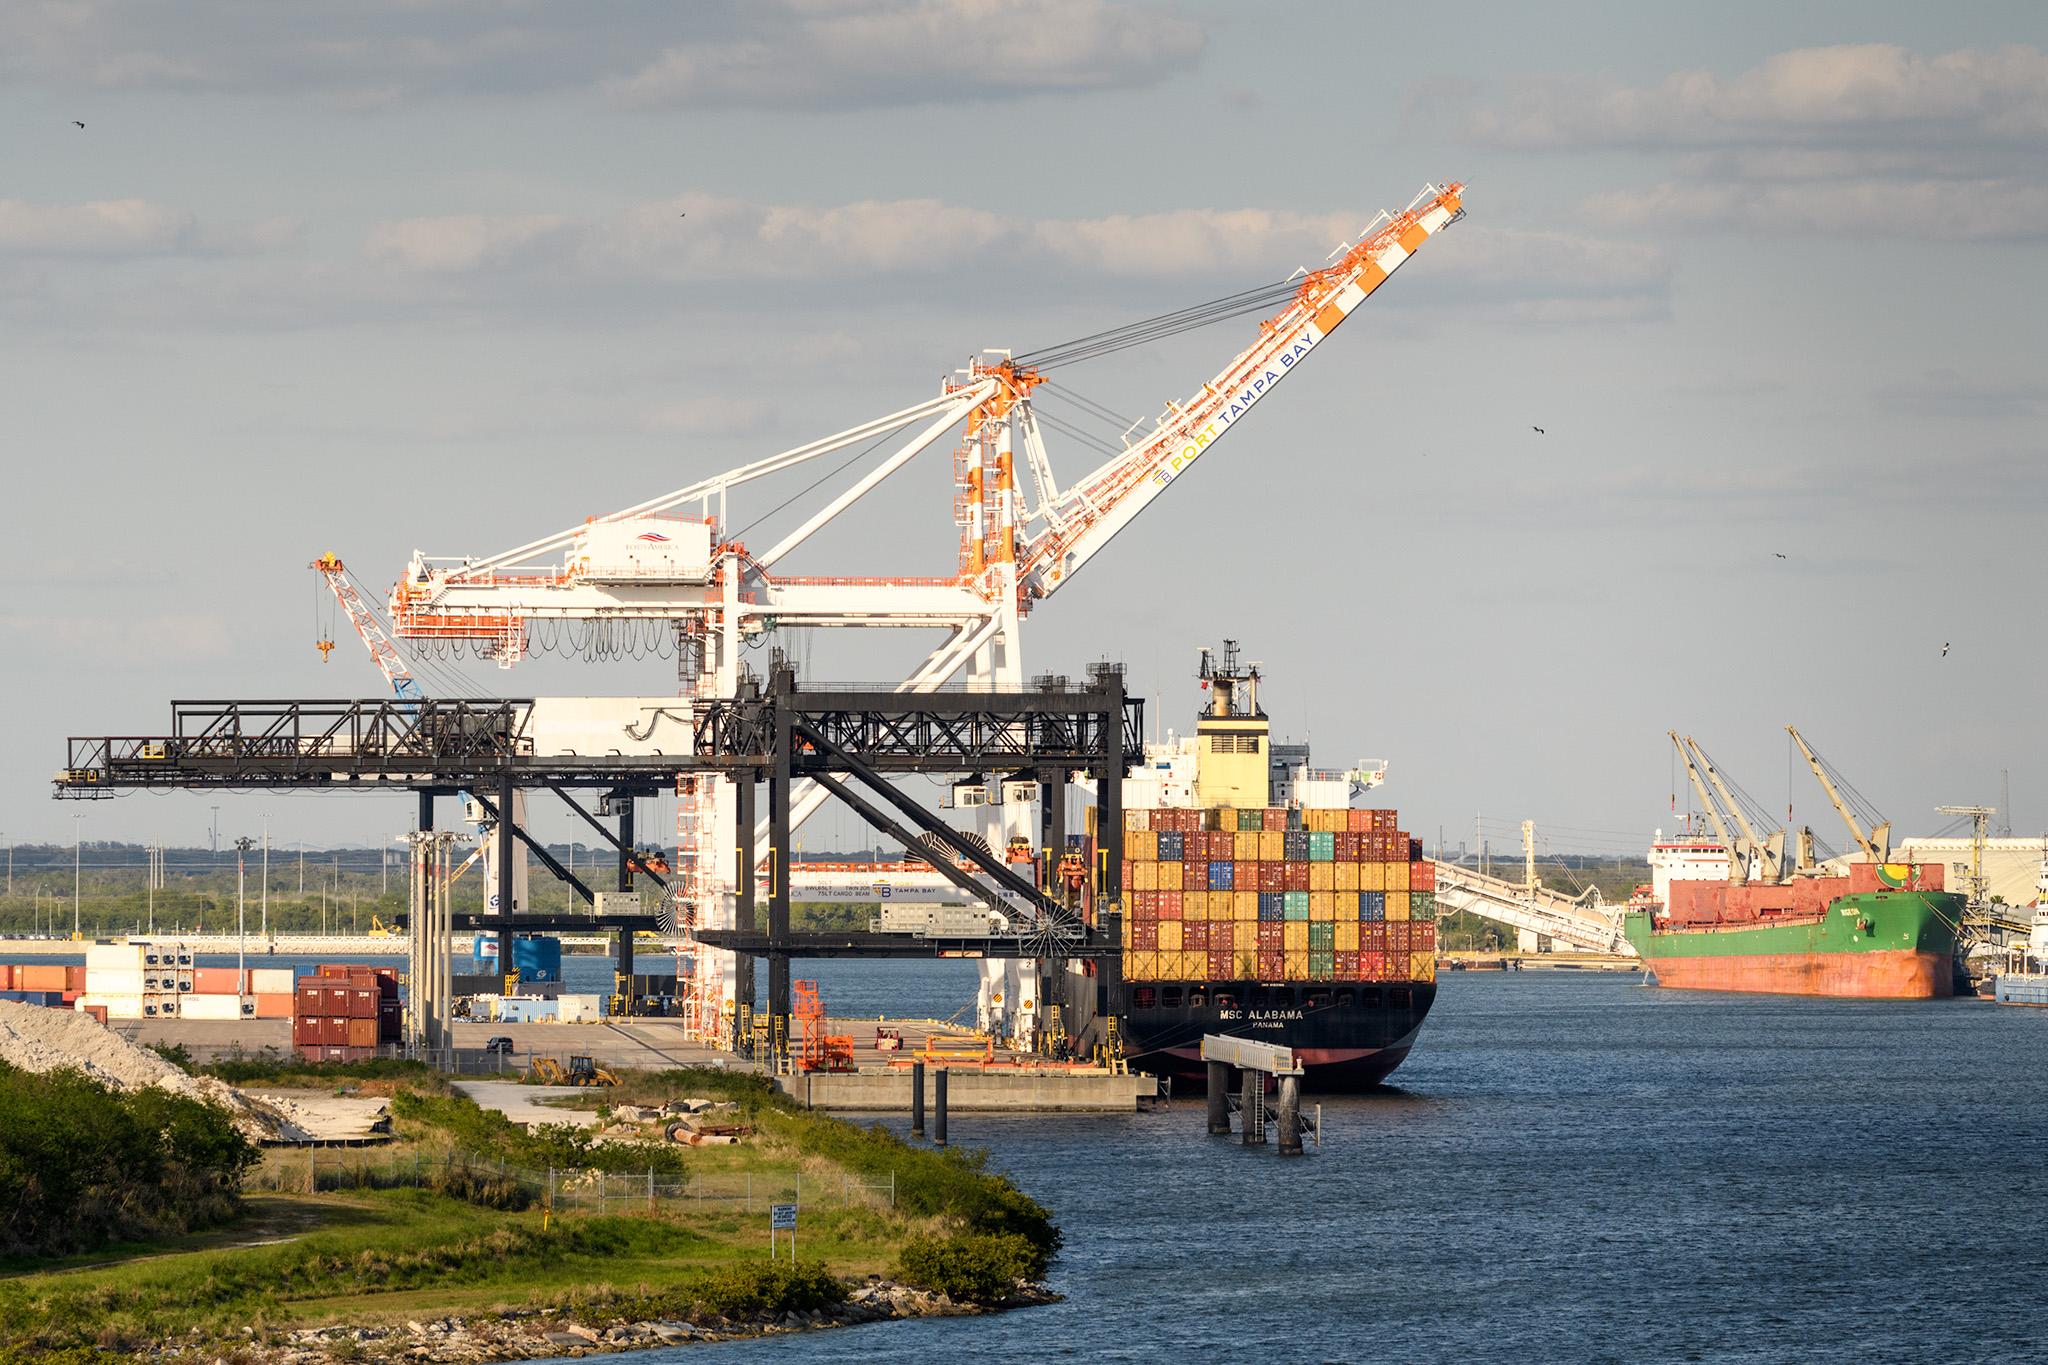 20170304 - Port of Tampa - 191.jpg